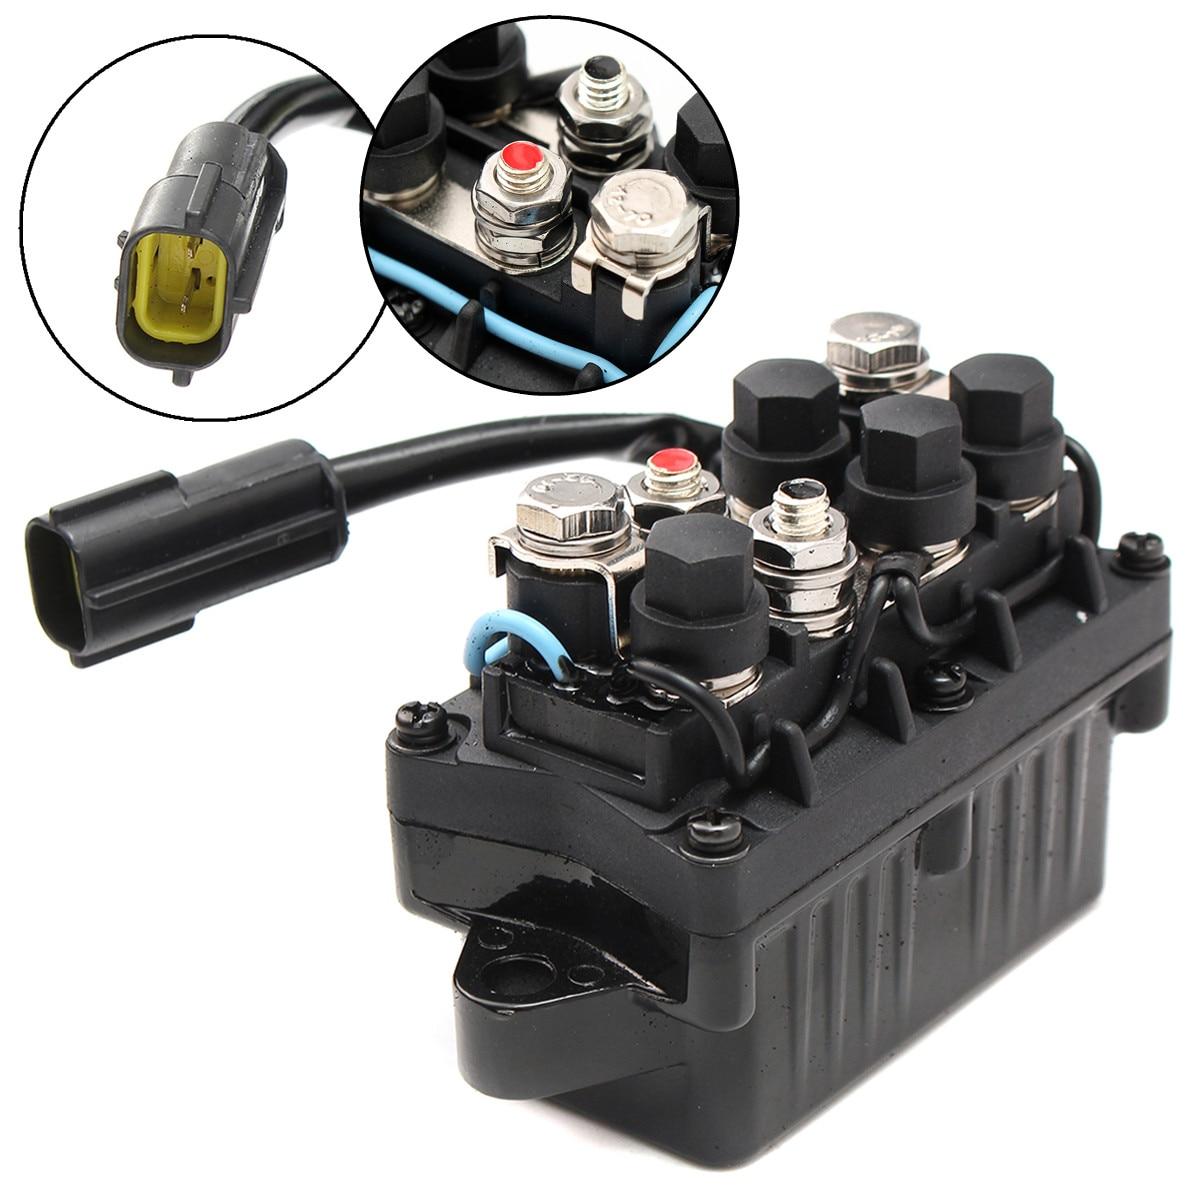 Boat Motor Power Trim & Relay 2 Pin For Yamaha Outboard 4 Stroke Engine 40 90HP Aluminum Bronze + Plastic IP67 Waterproof